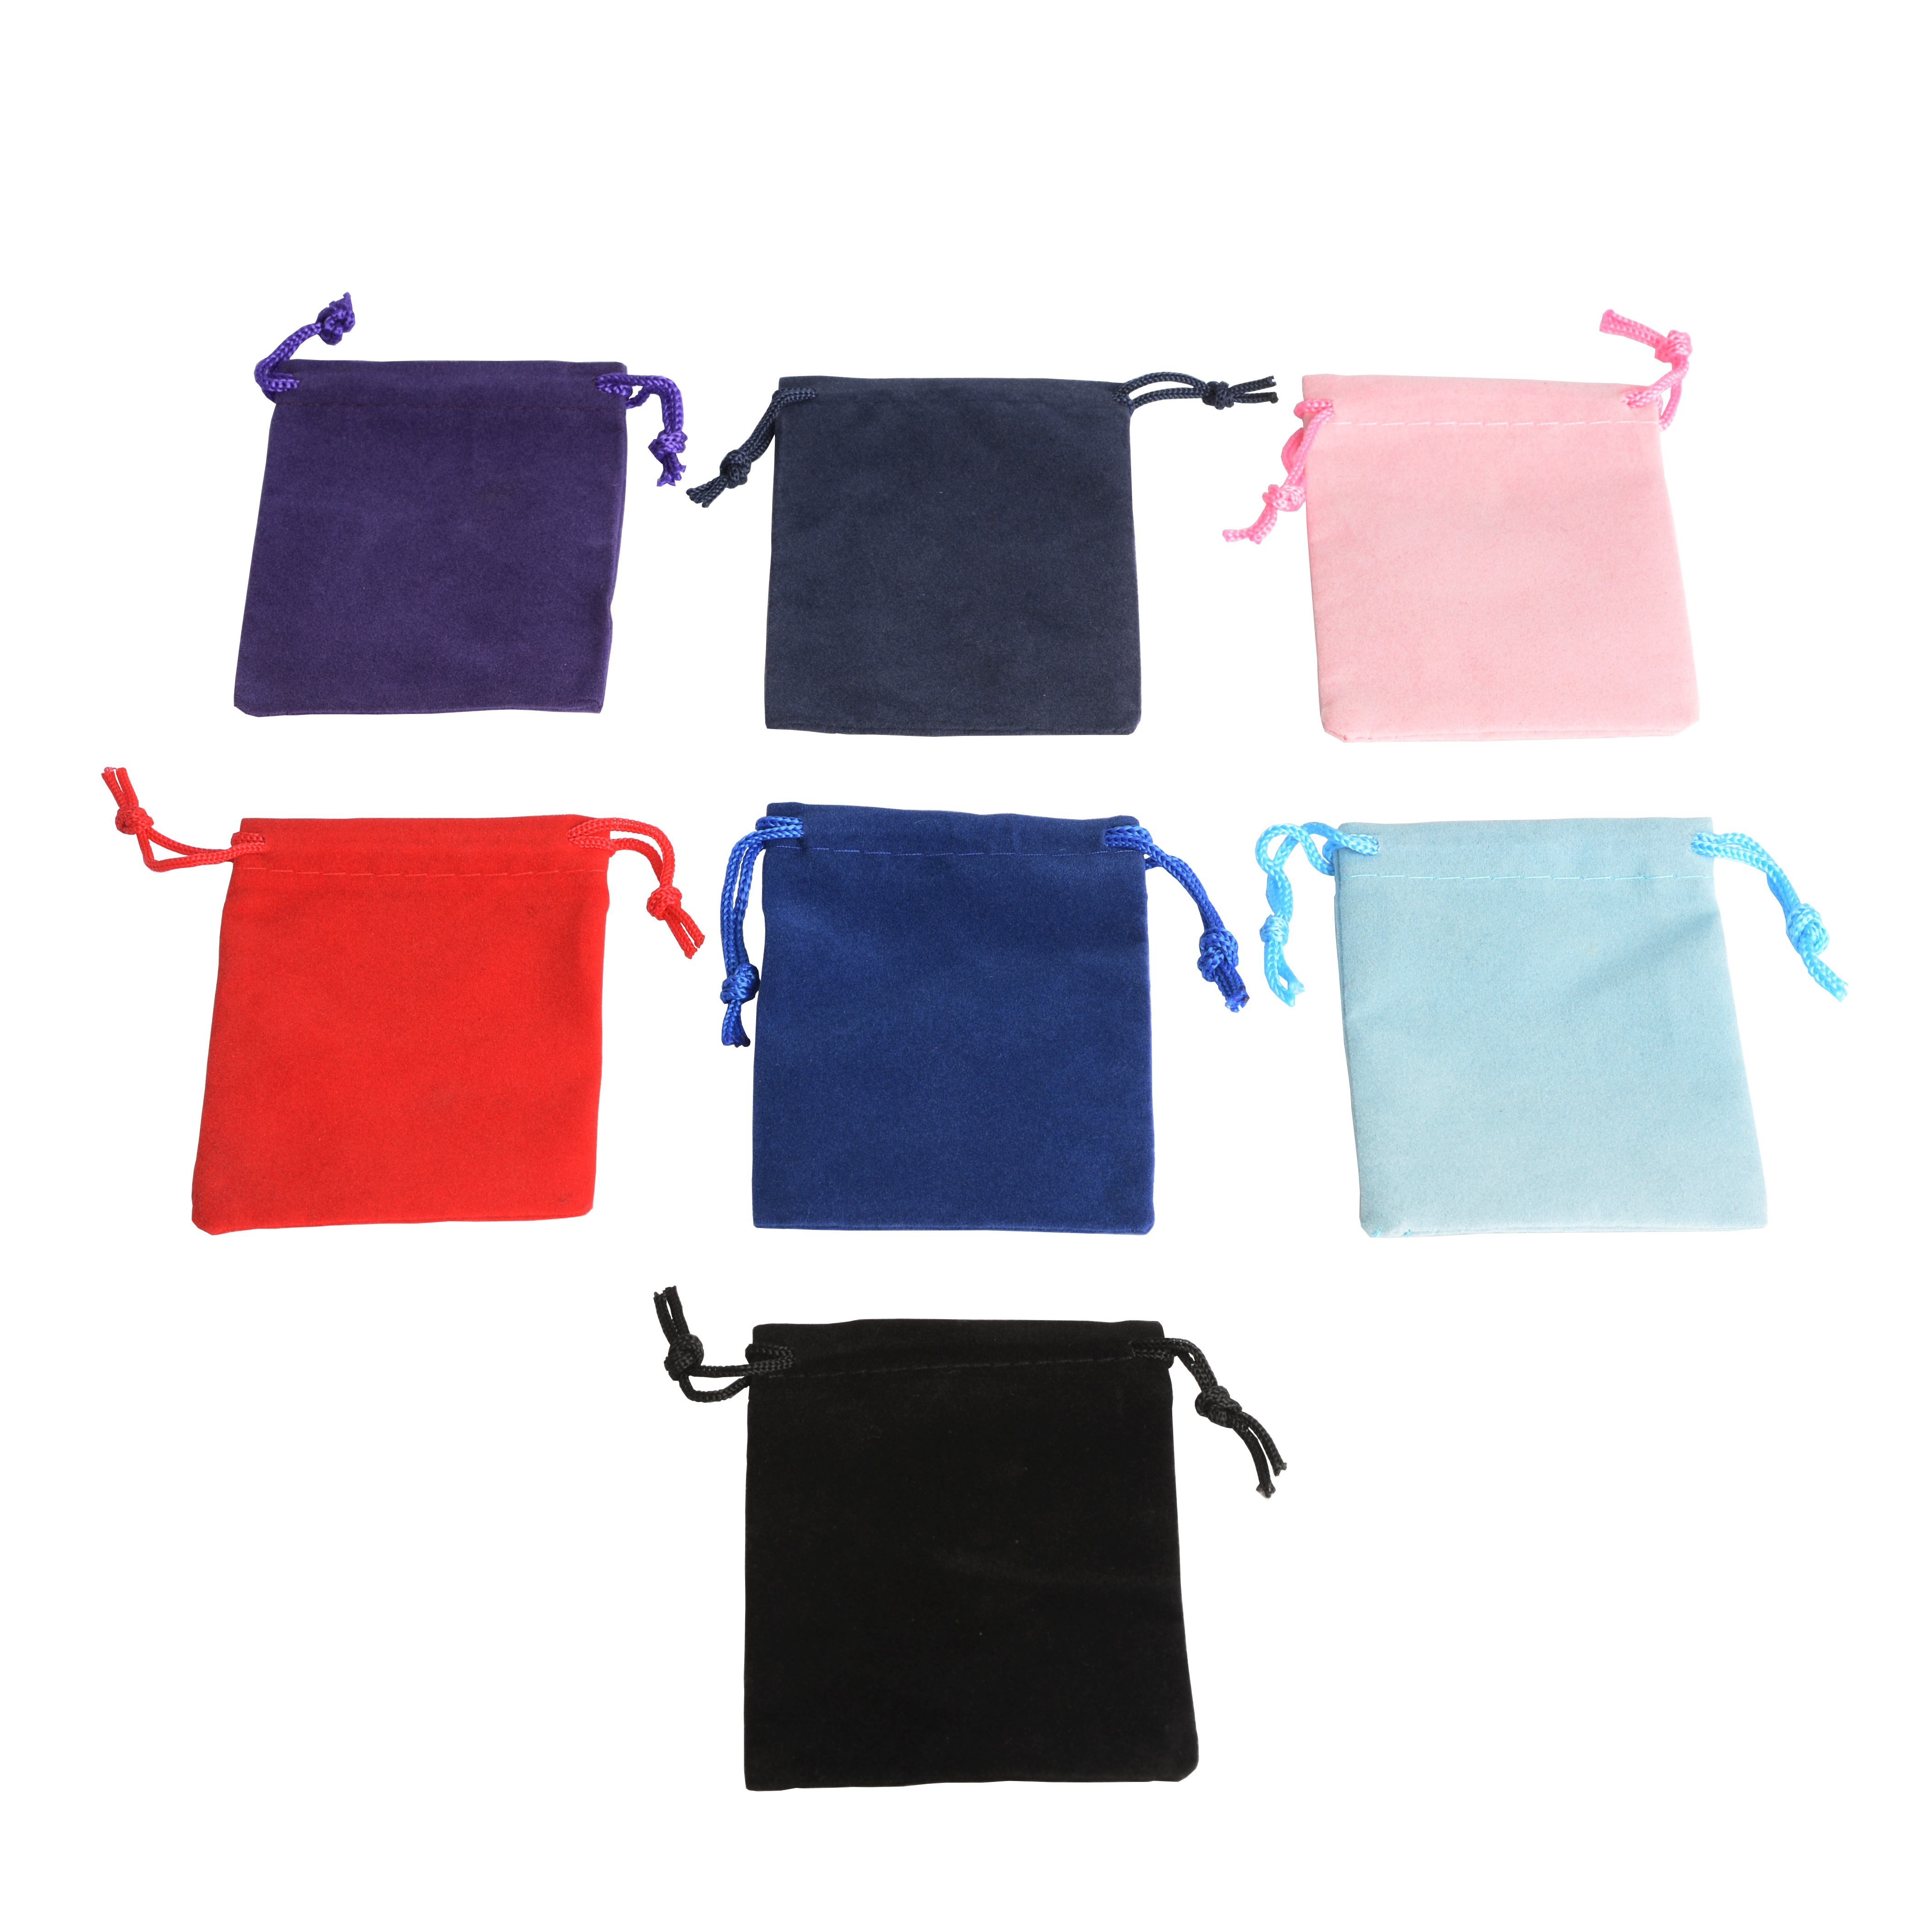 De Bijoux 100Pcs Mix Color 5x7cm Velvet Bag Ring Jewelry Bag Velvet Pouch For Wedding Birthday Annual Party Promotion Gift Bags